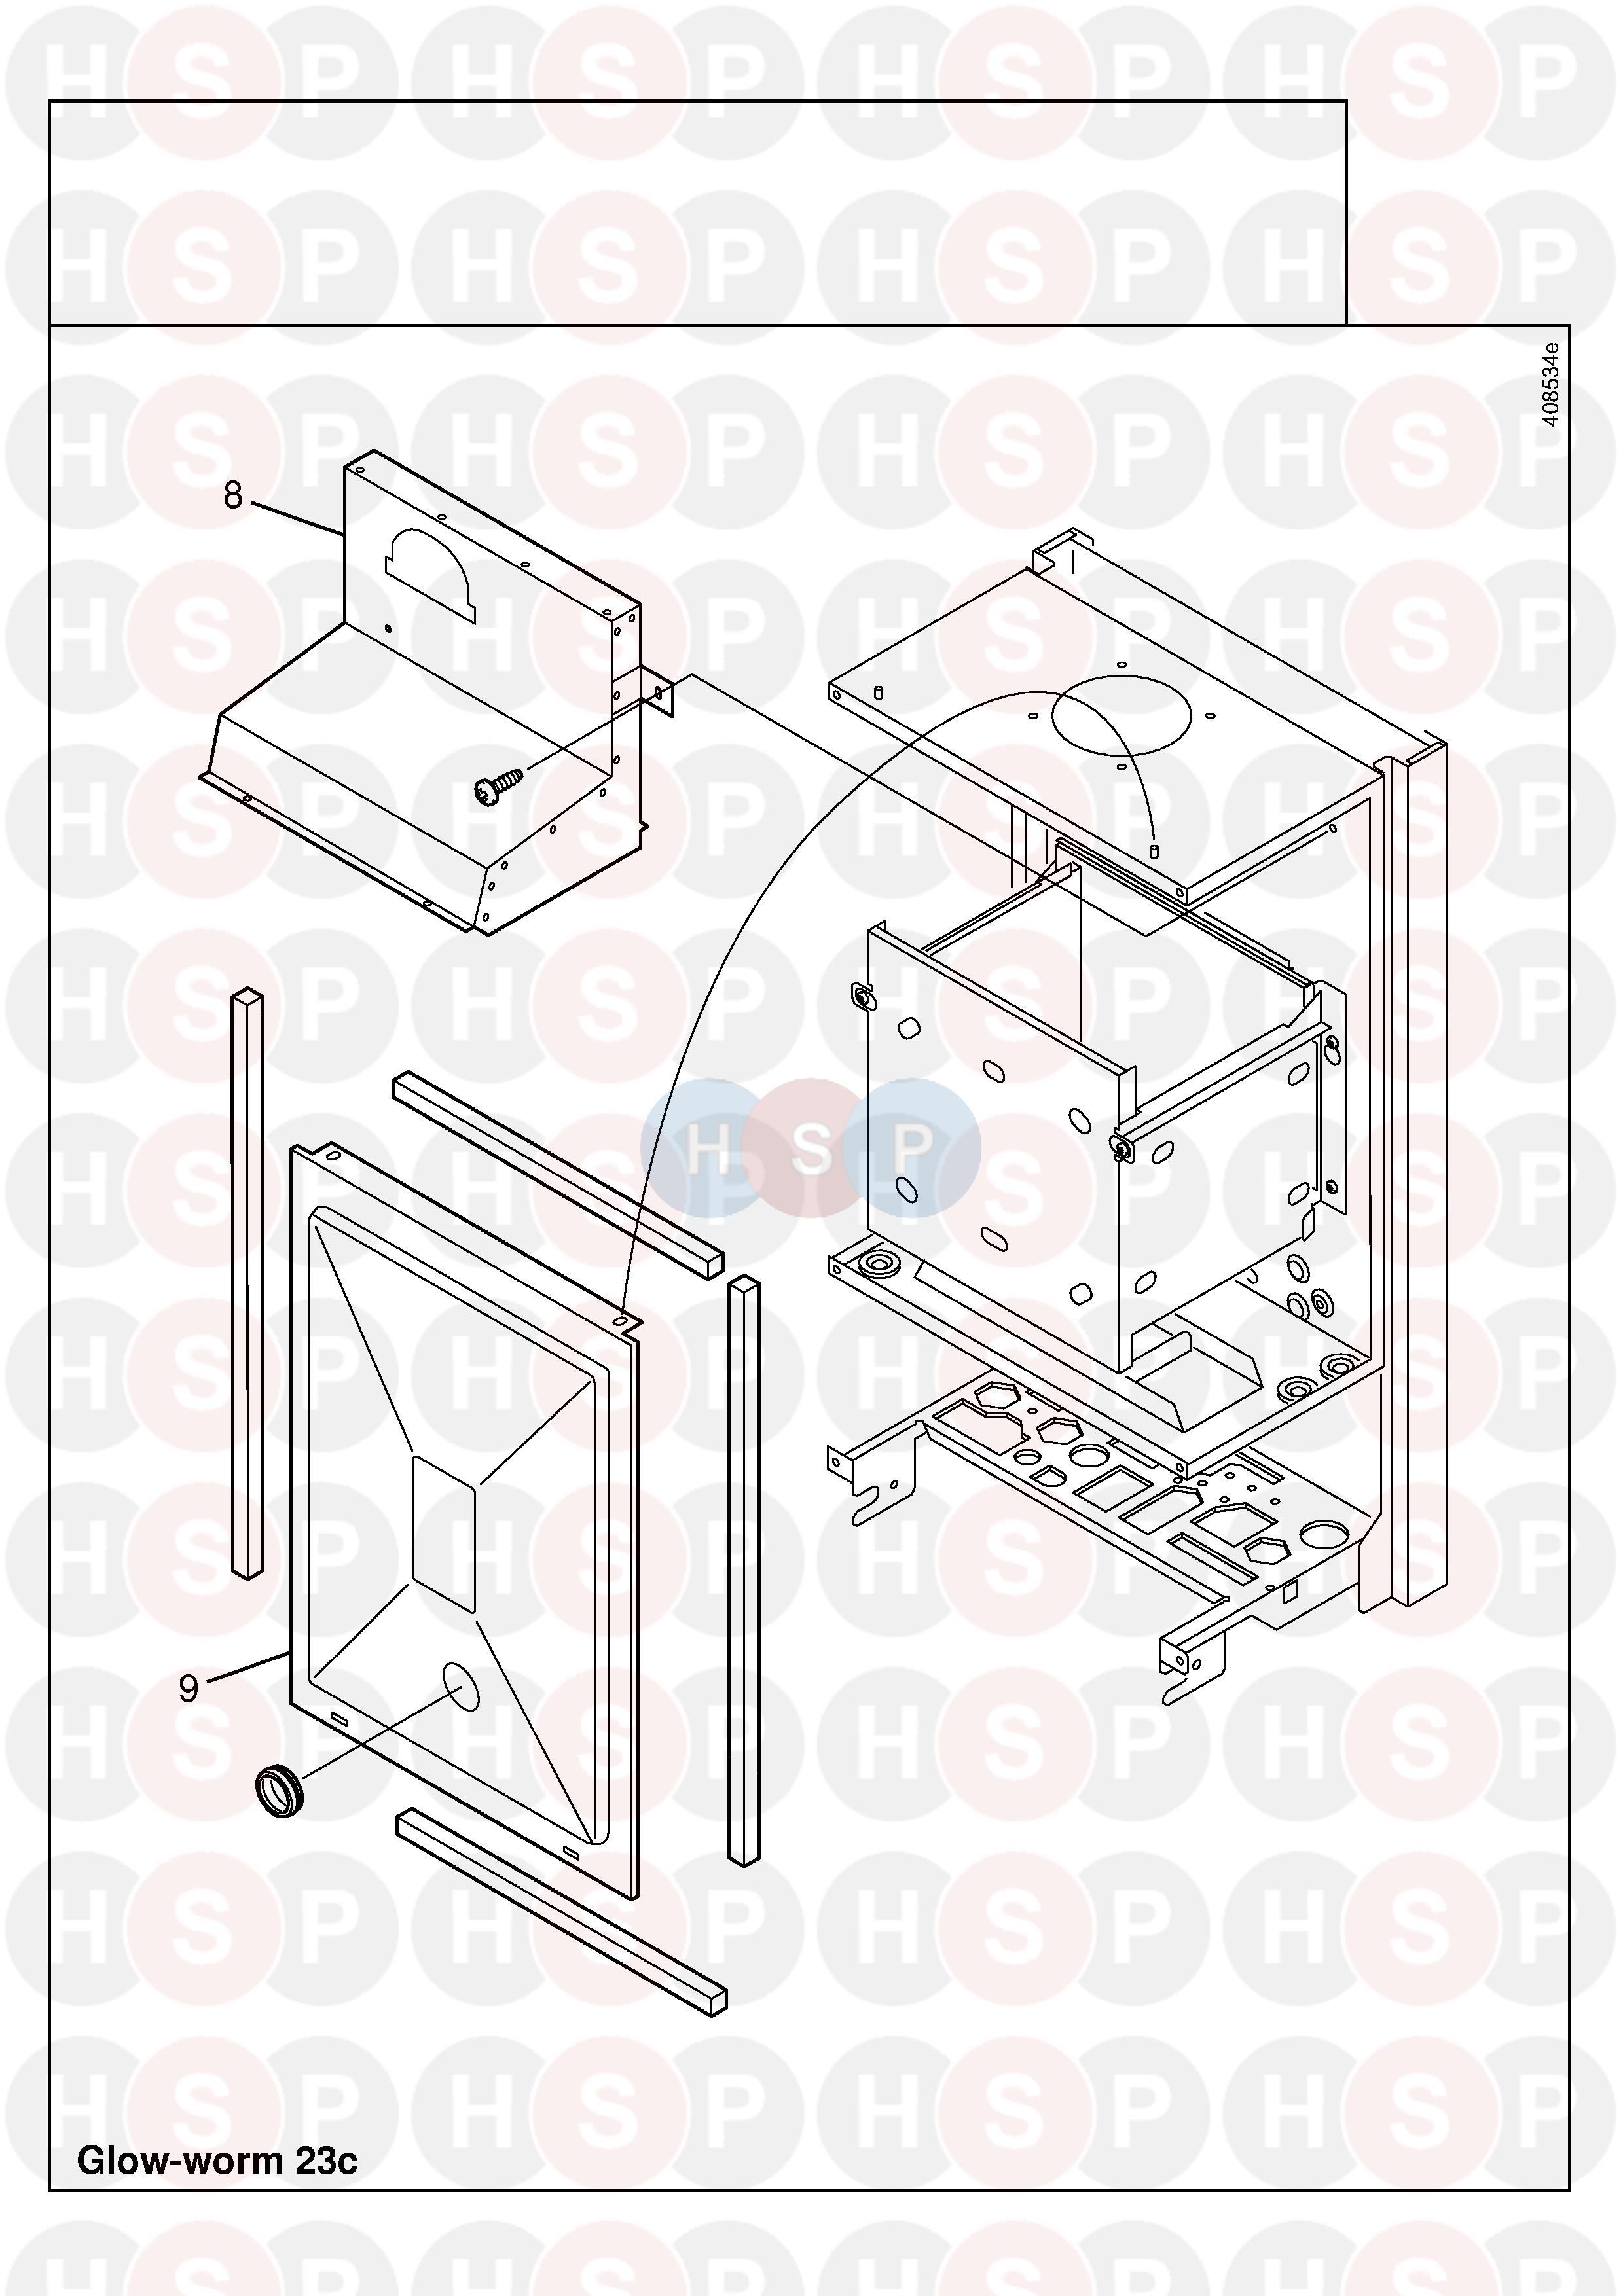 Glowworm GLOWWORM 24CI (CASING 3) Diagram | Heating Spare Parts